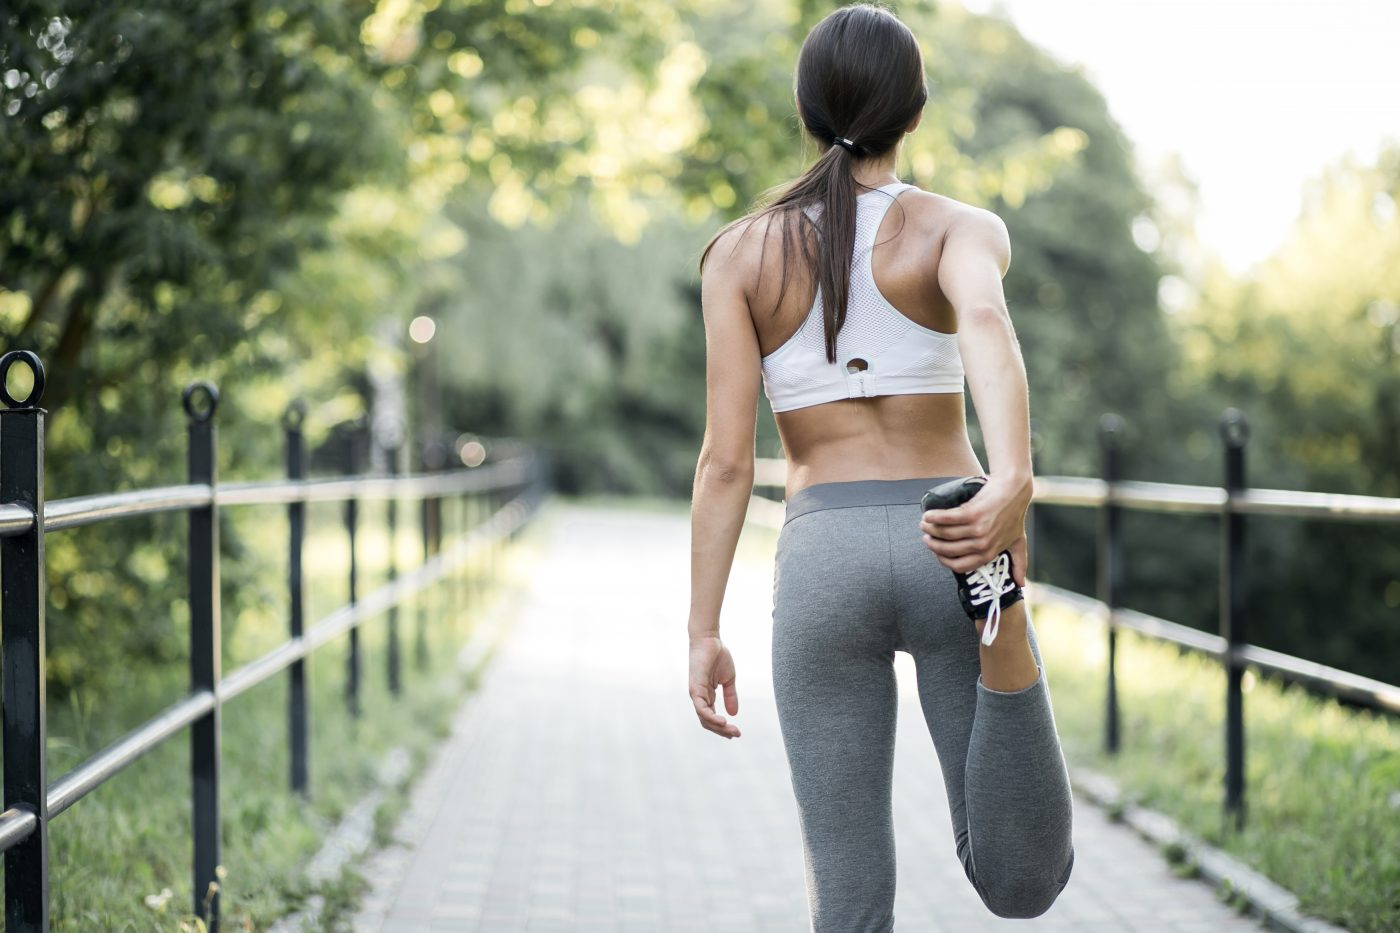 MONDAY WORKOUT ROUTINE – Bodyweight Lower Body